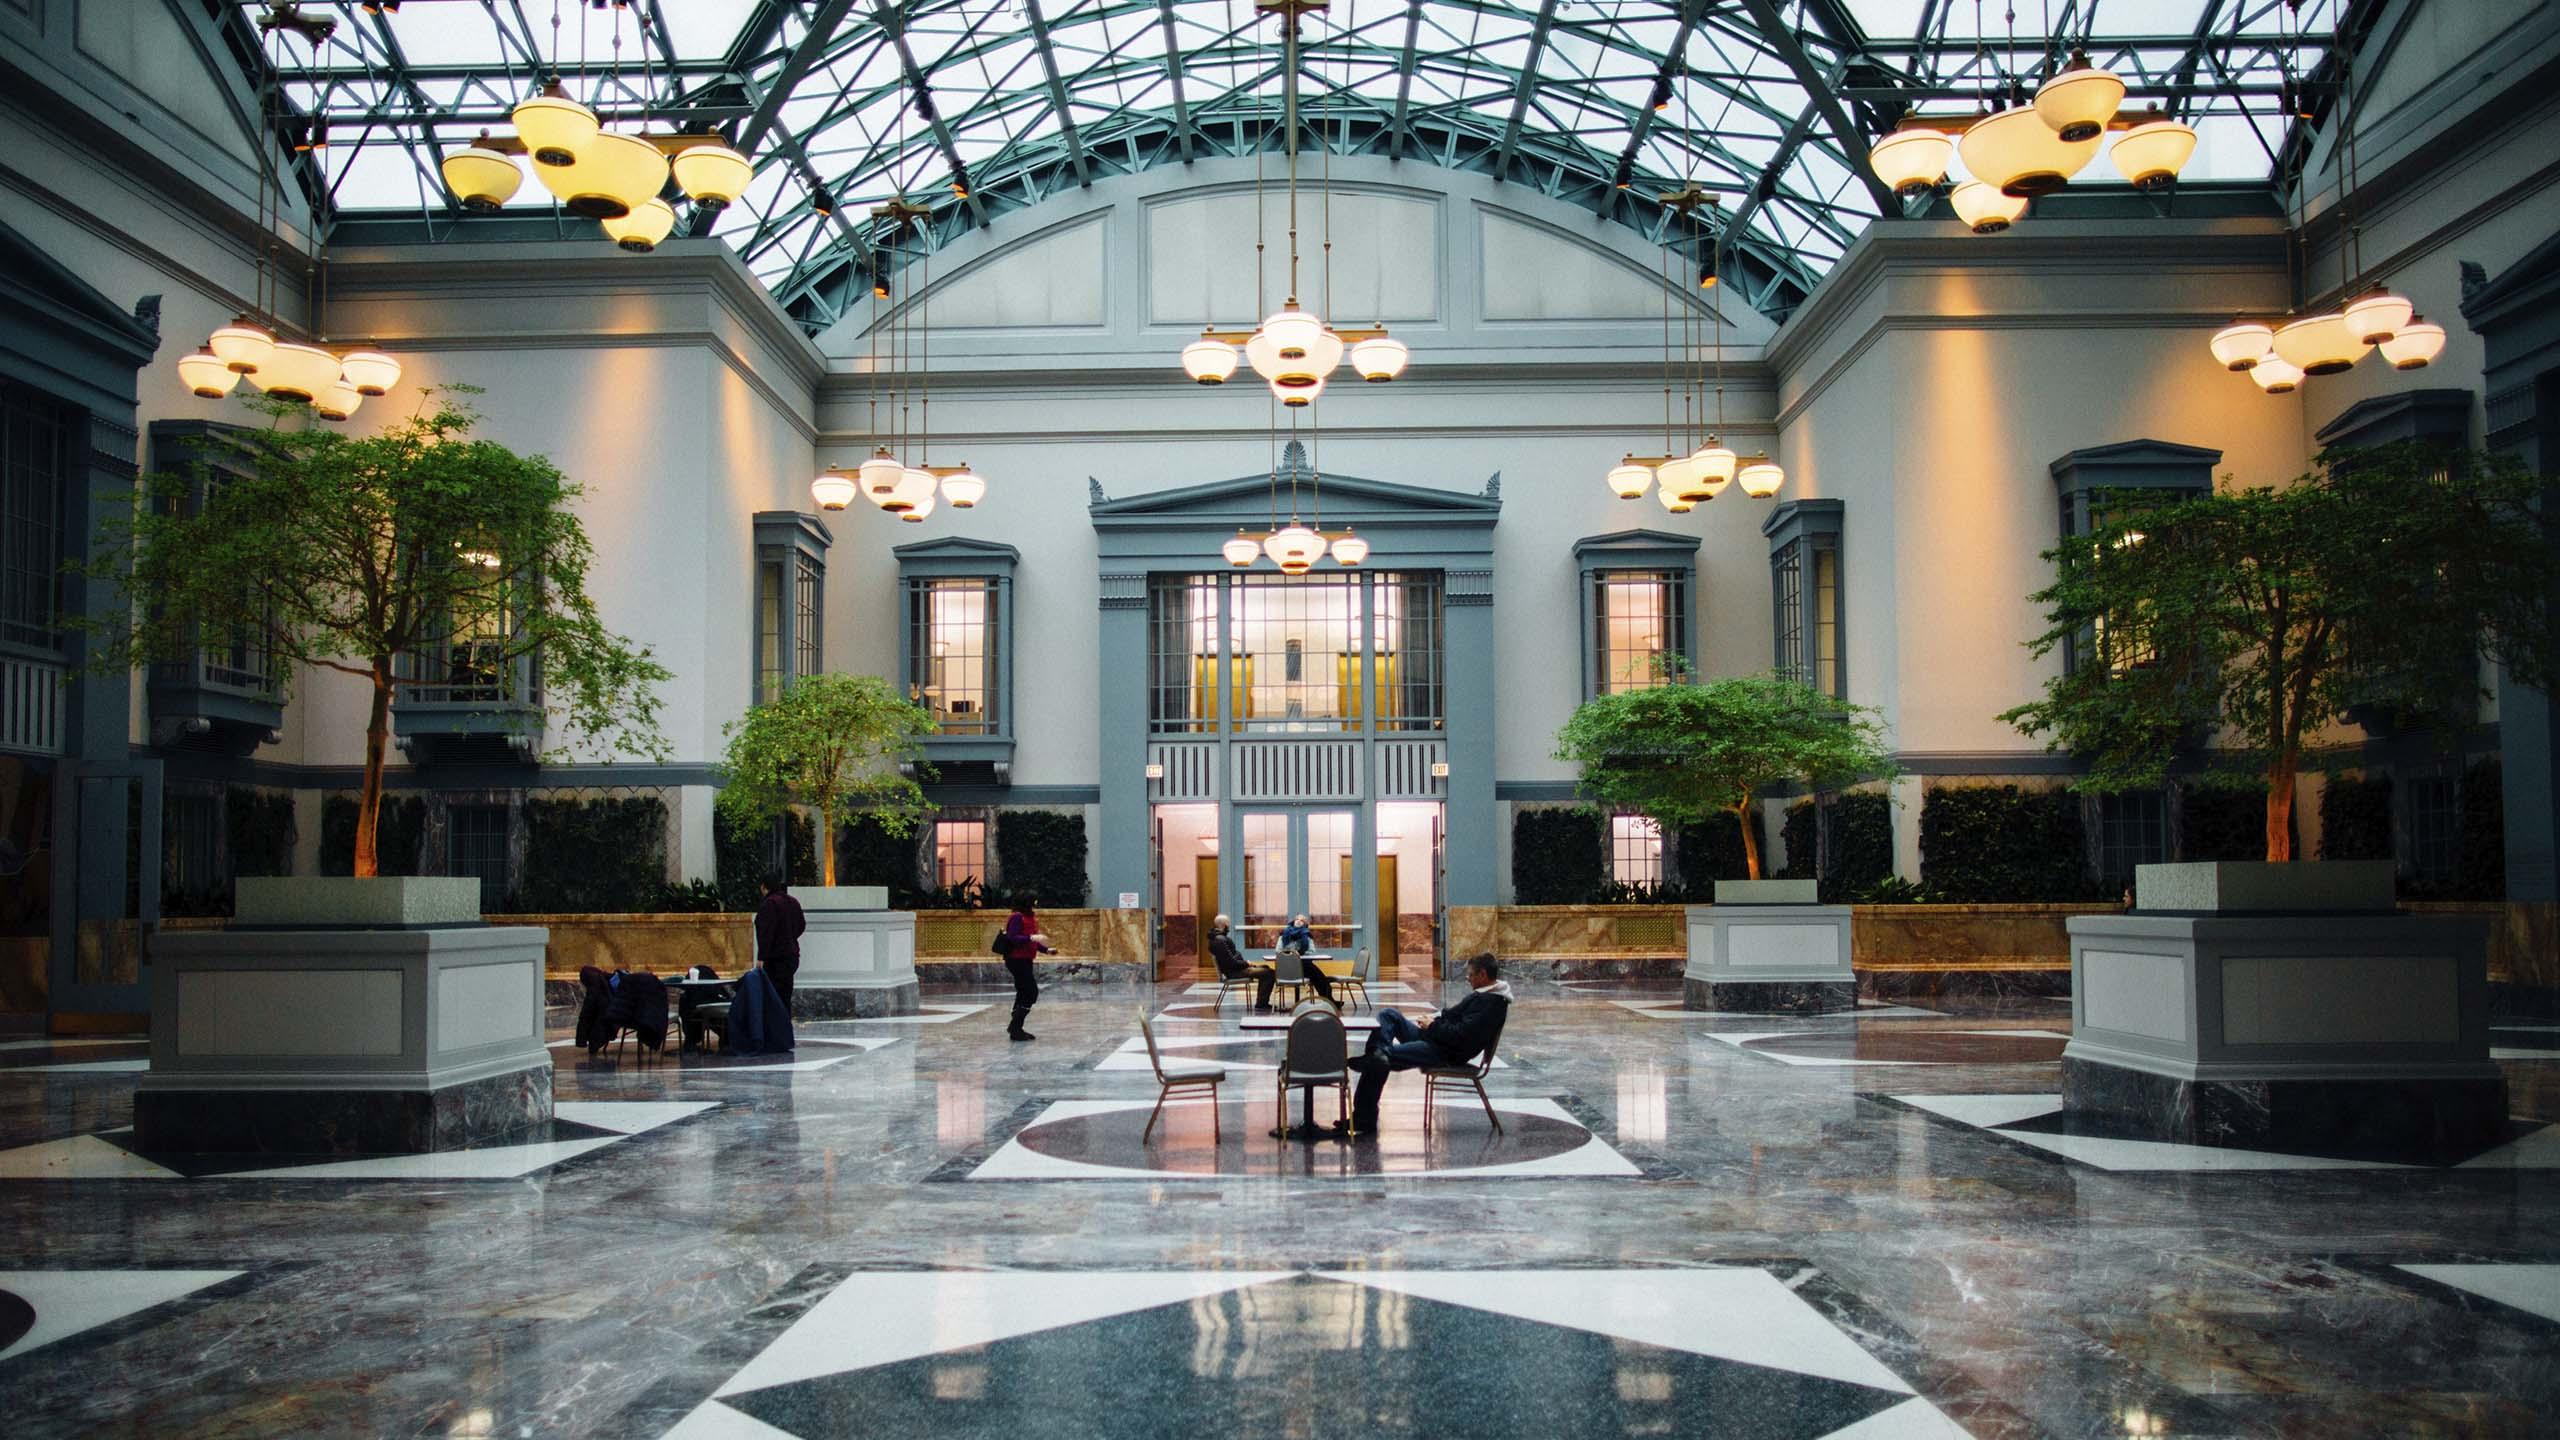 2022 Interior design trends; greenery